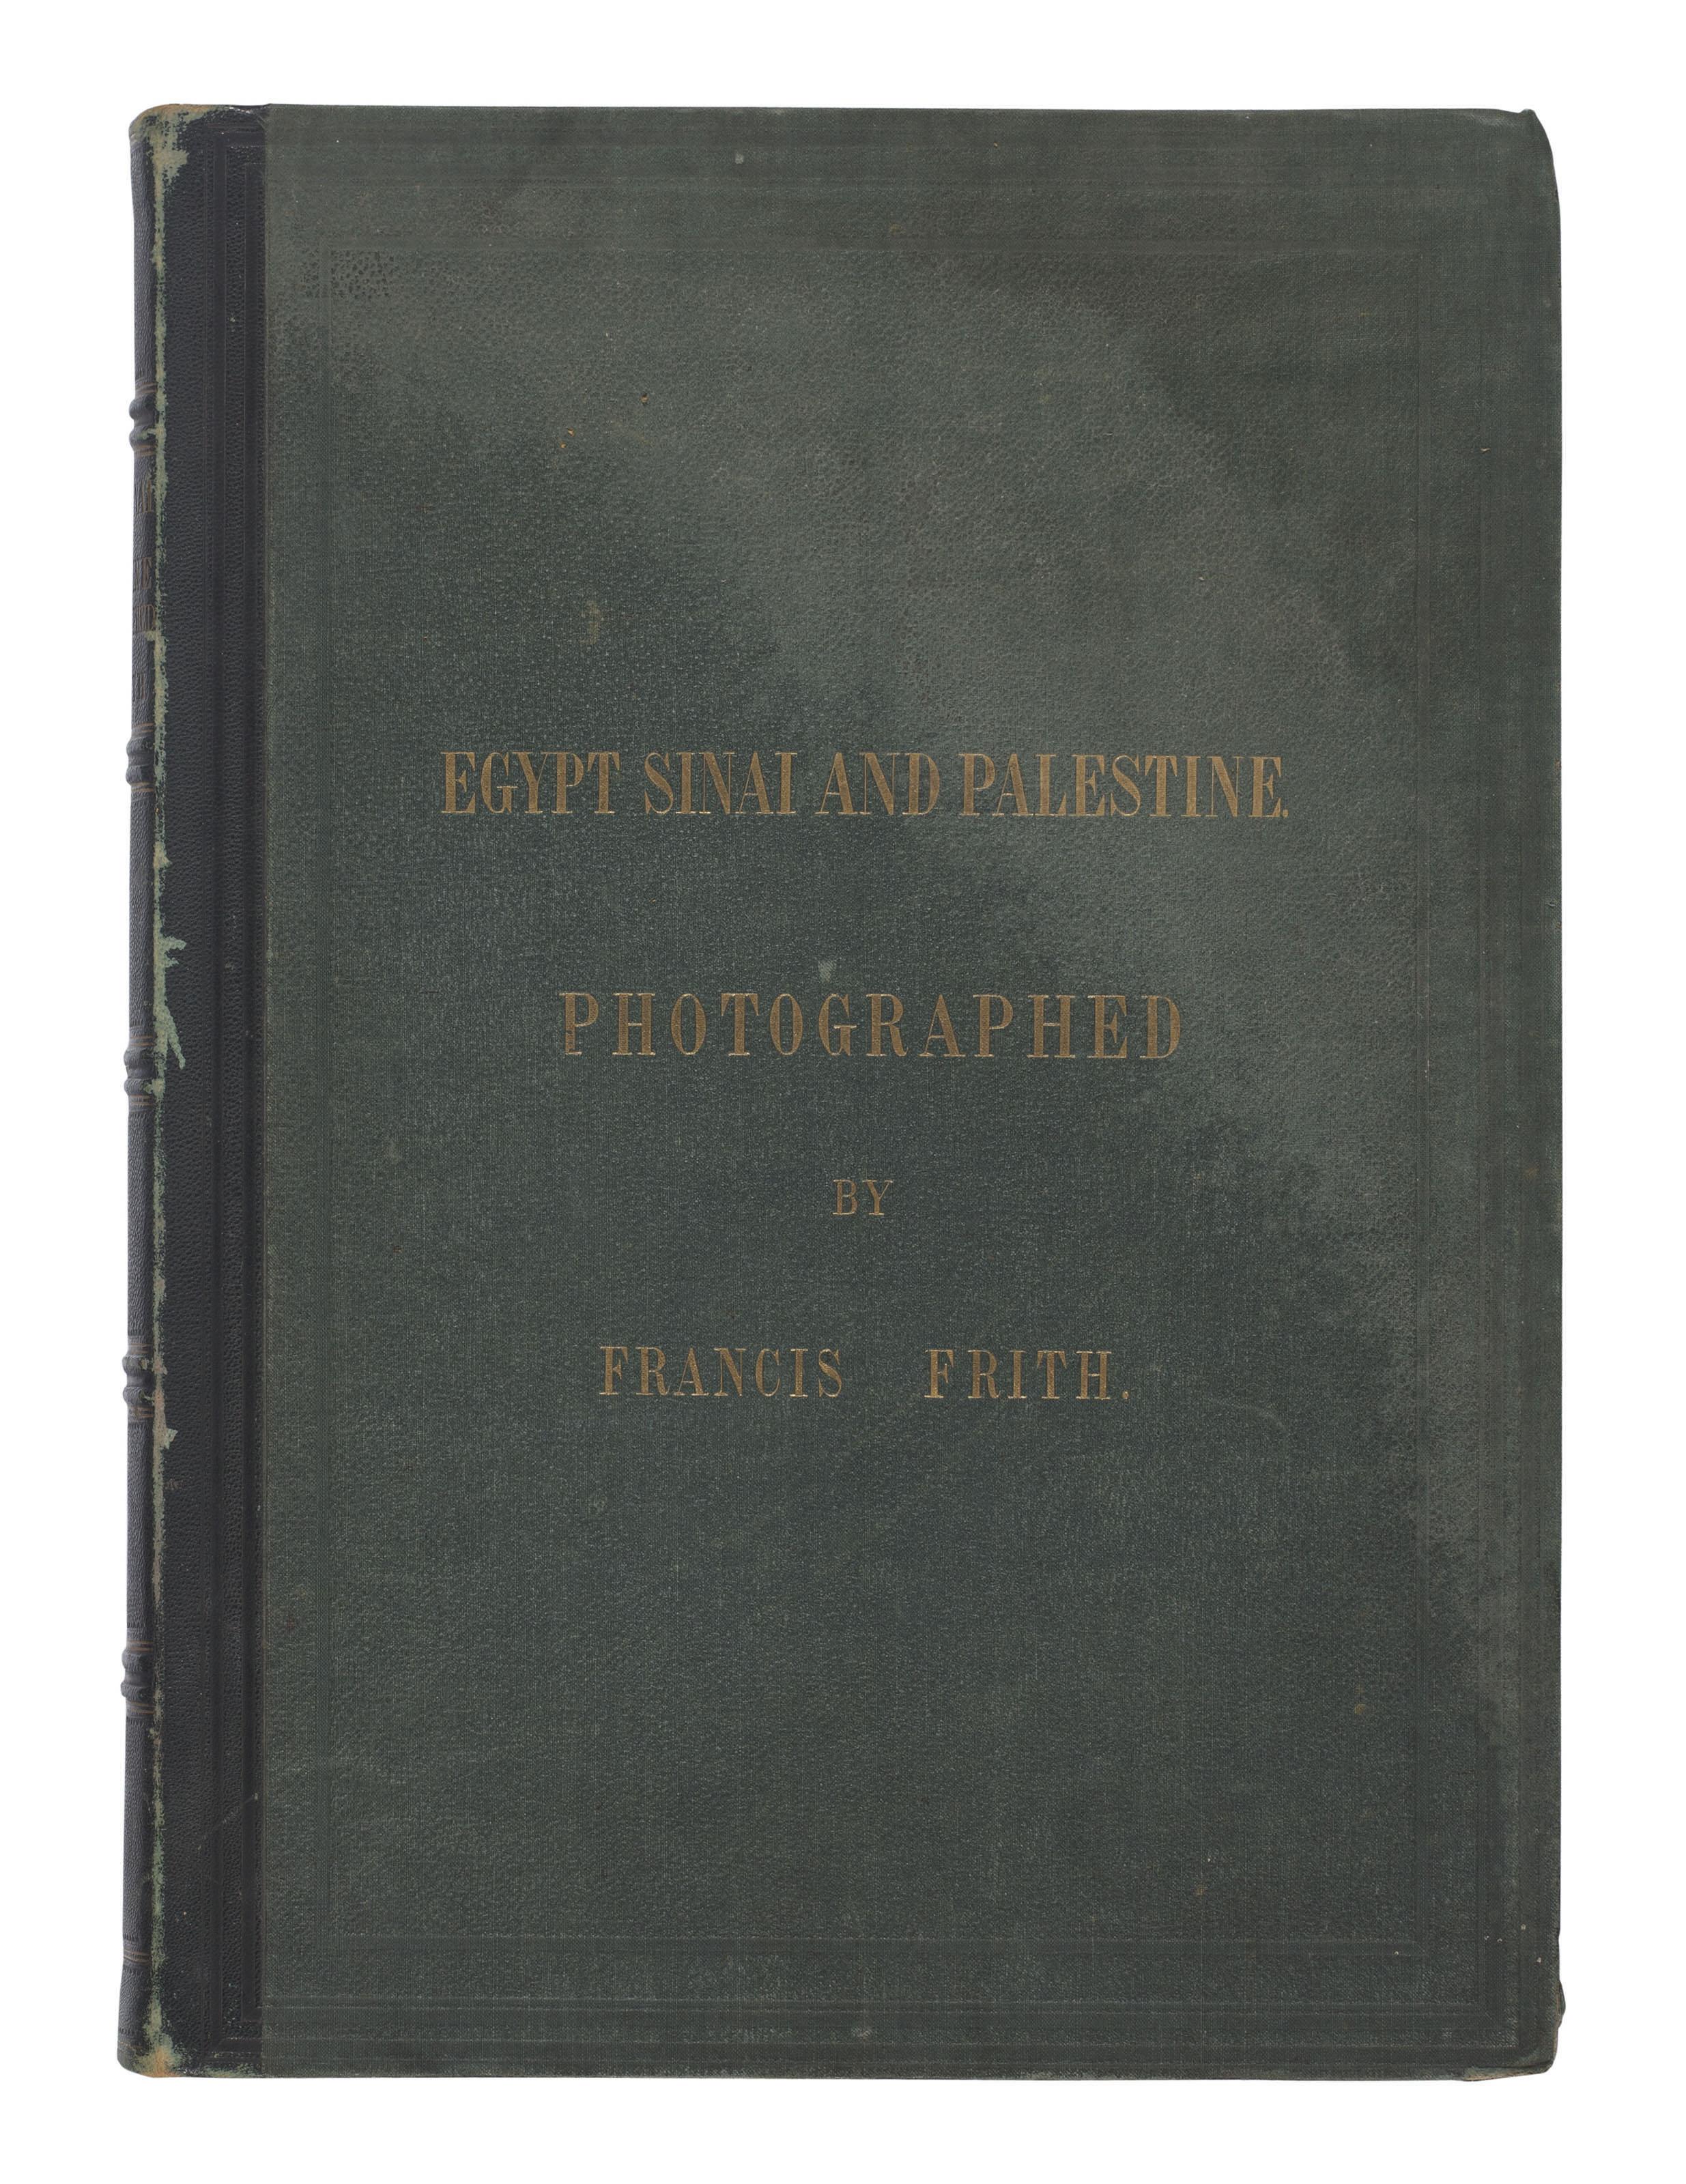 FRANCIS FRITH (1822–1898)